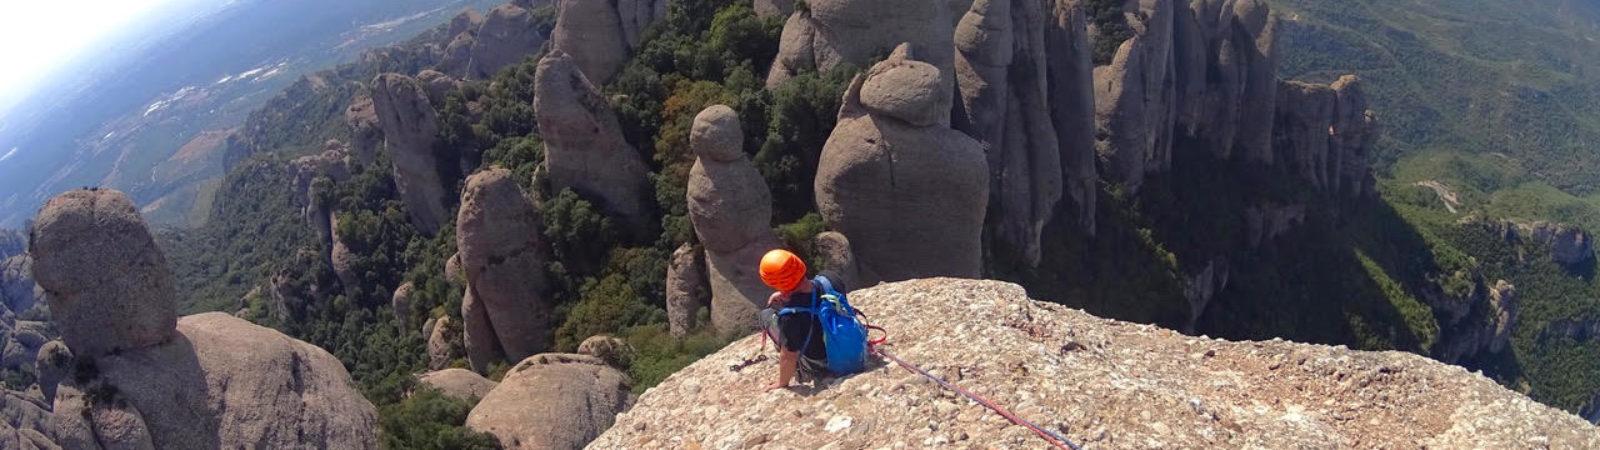 Barcelona, Montserrat, Guided Rock Climbing